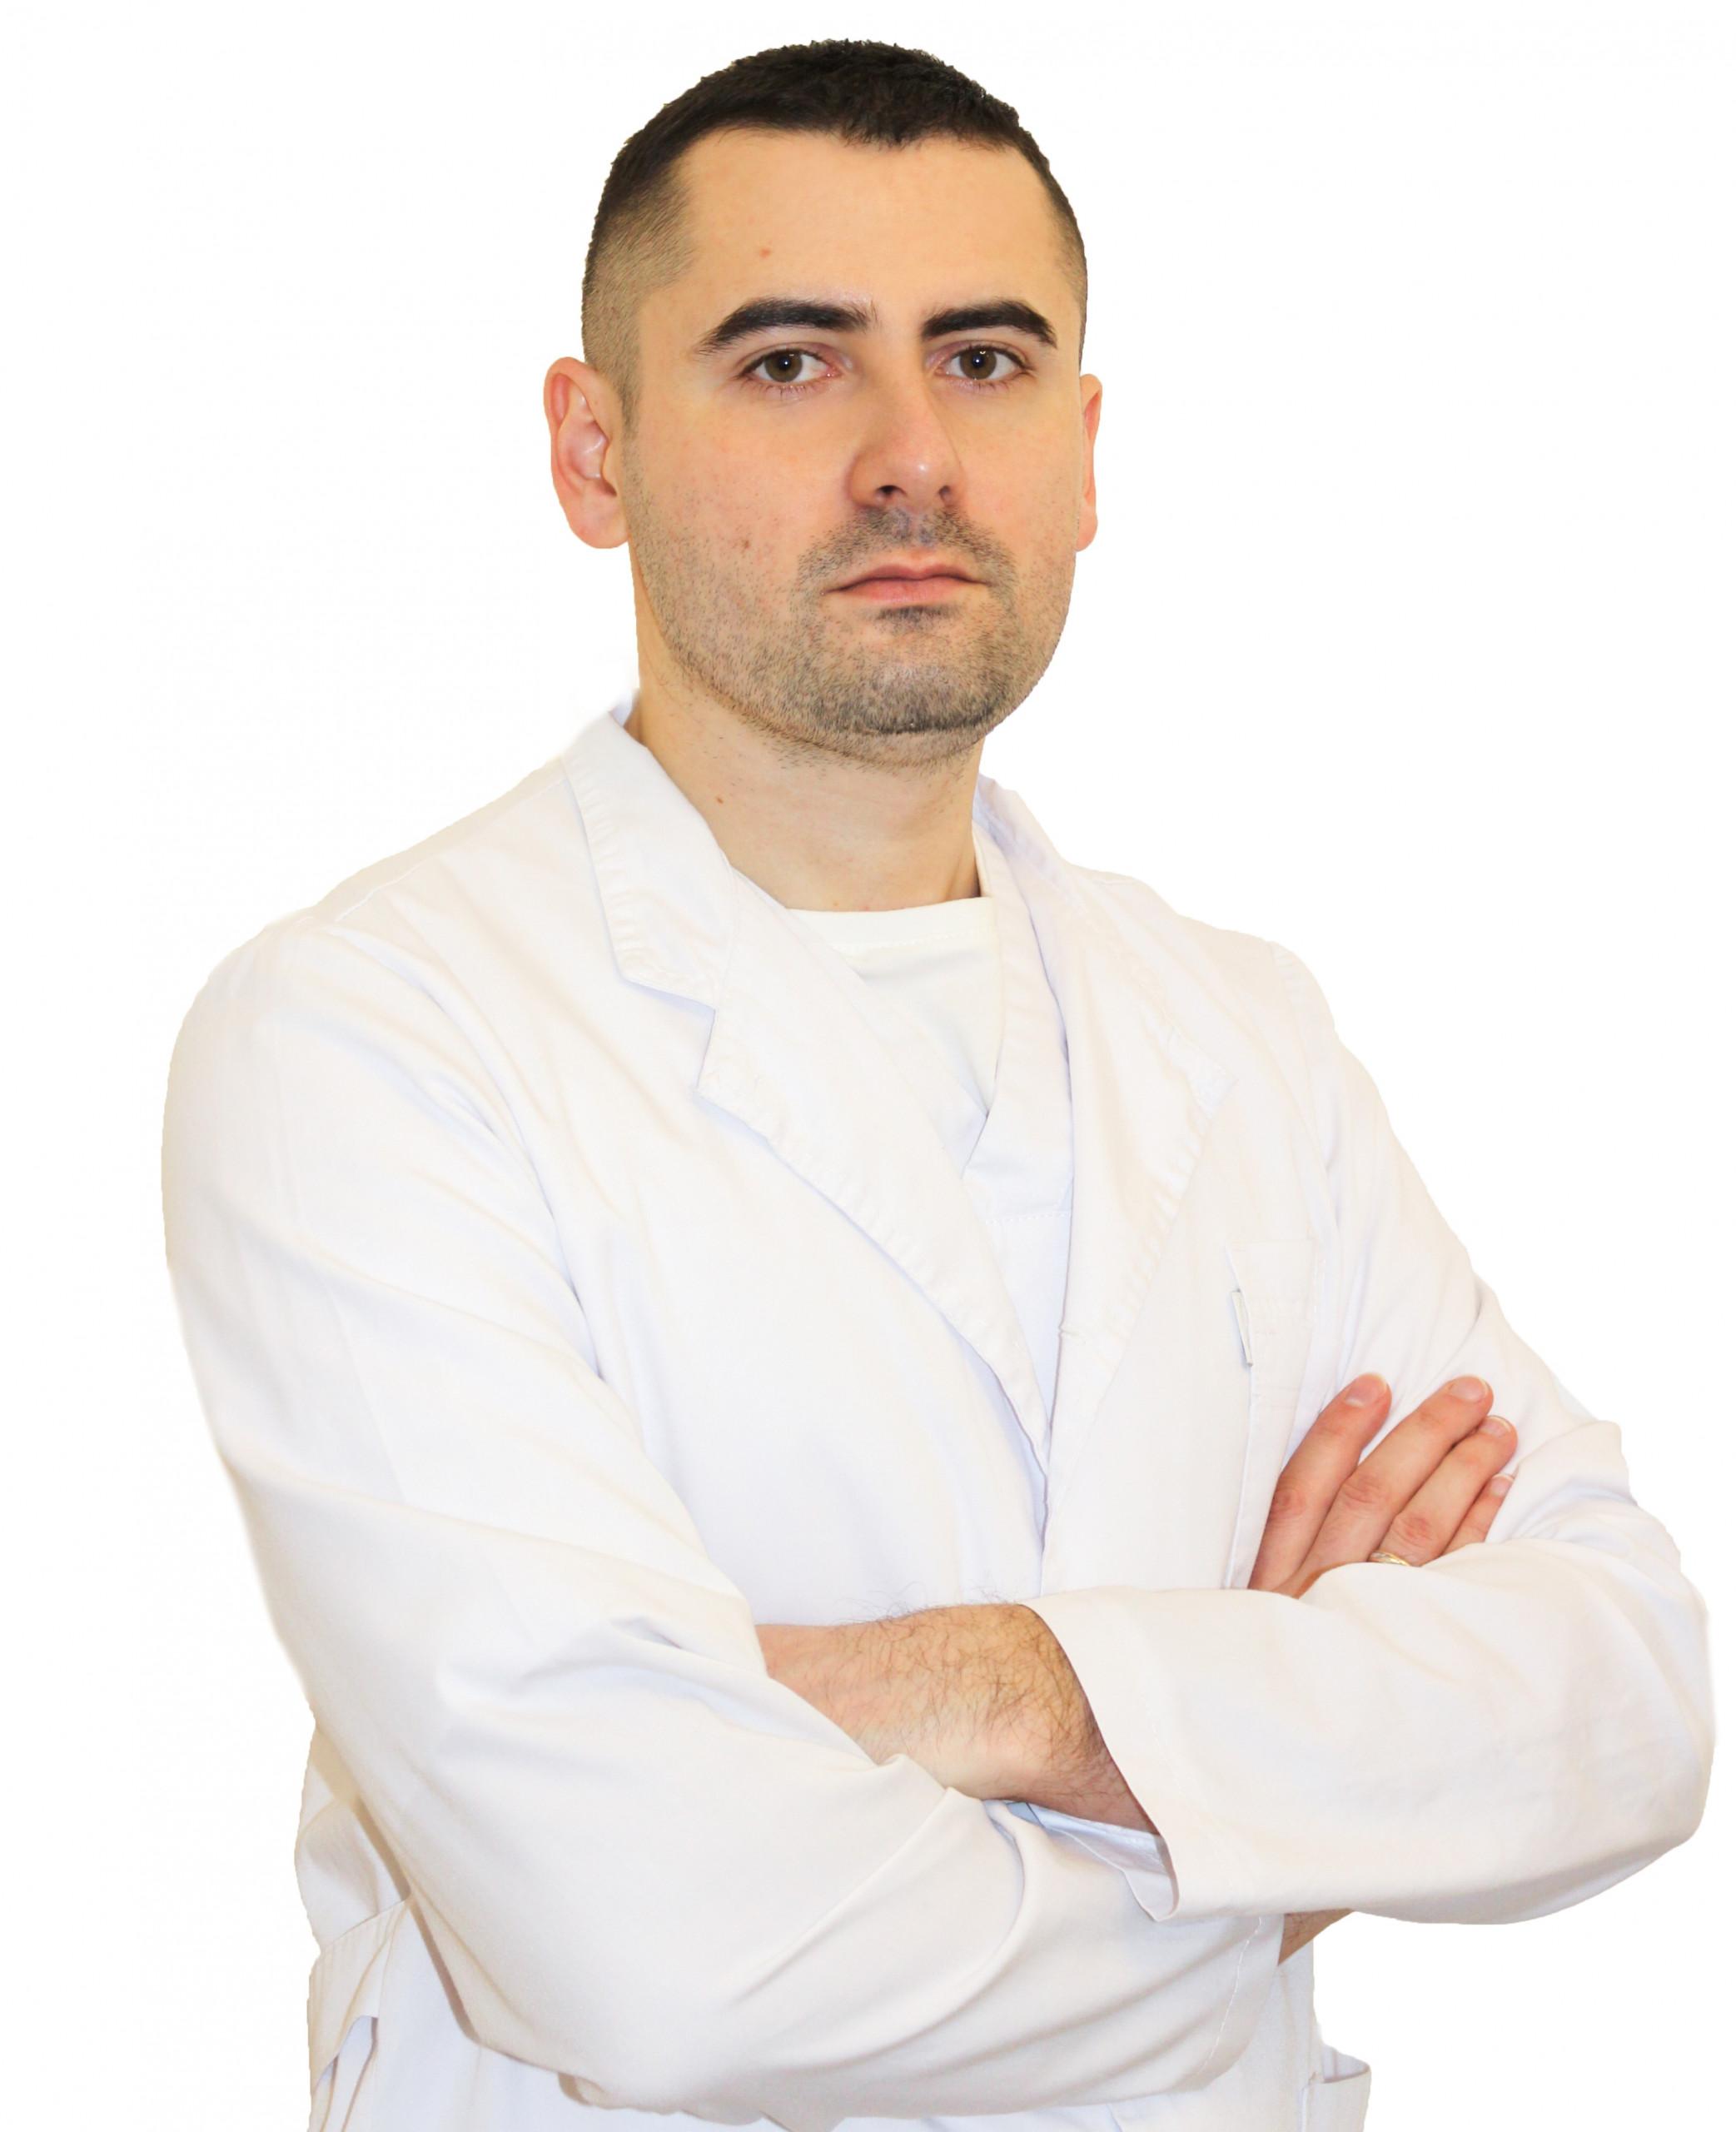 Шостак Александр Тадеушович   Врач-рентгенолог